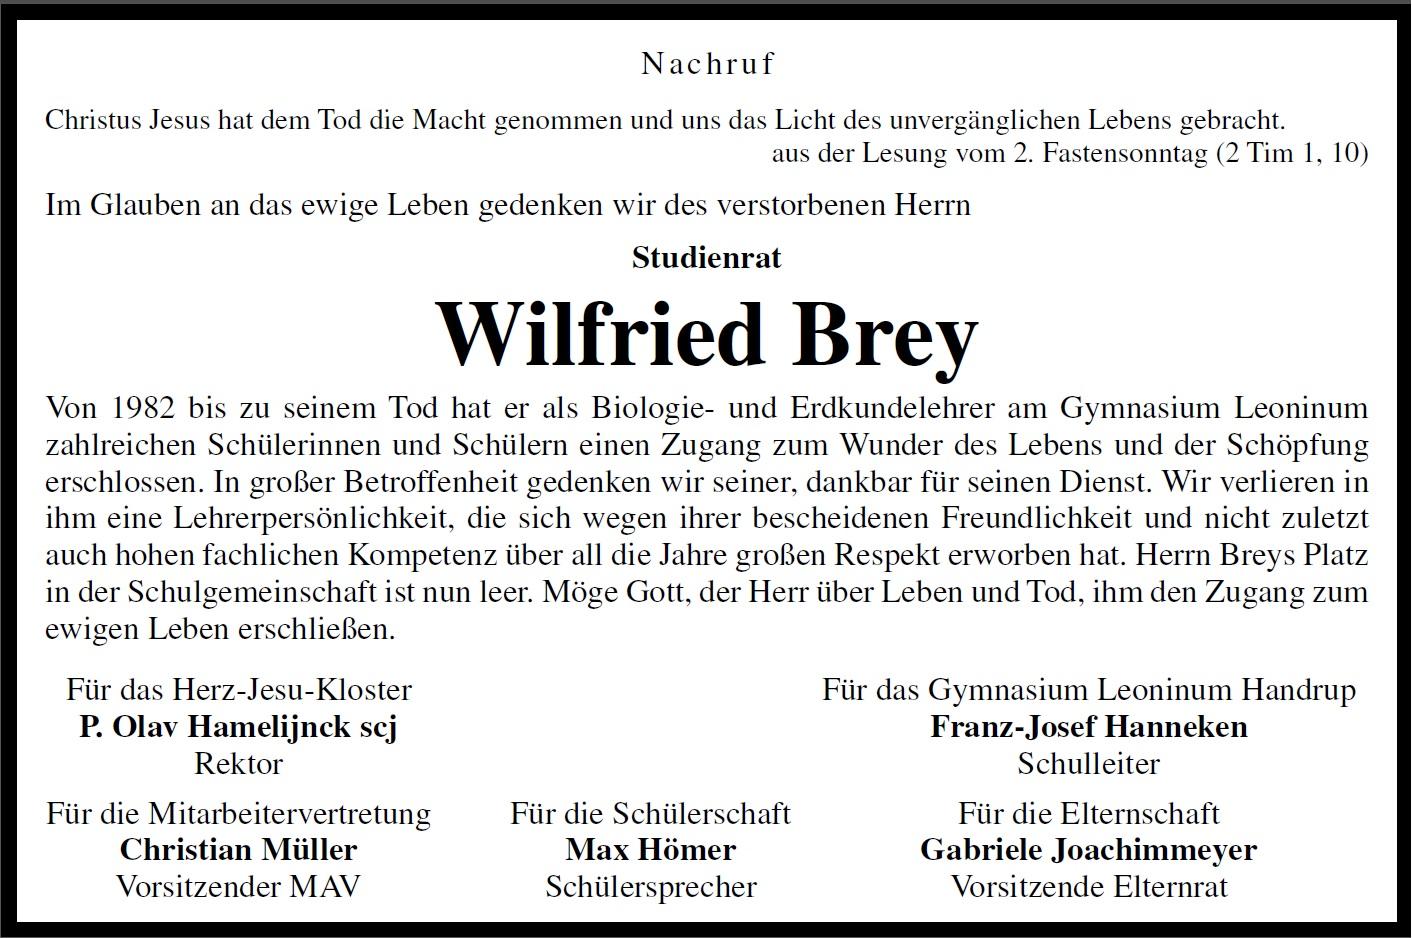 66 Nachruf Wilfried Brey